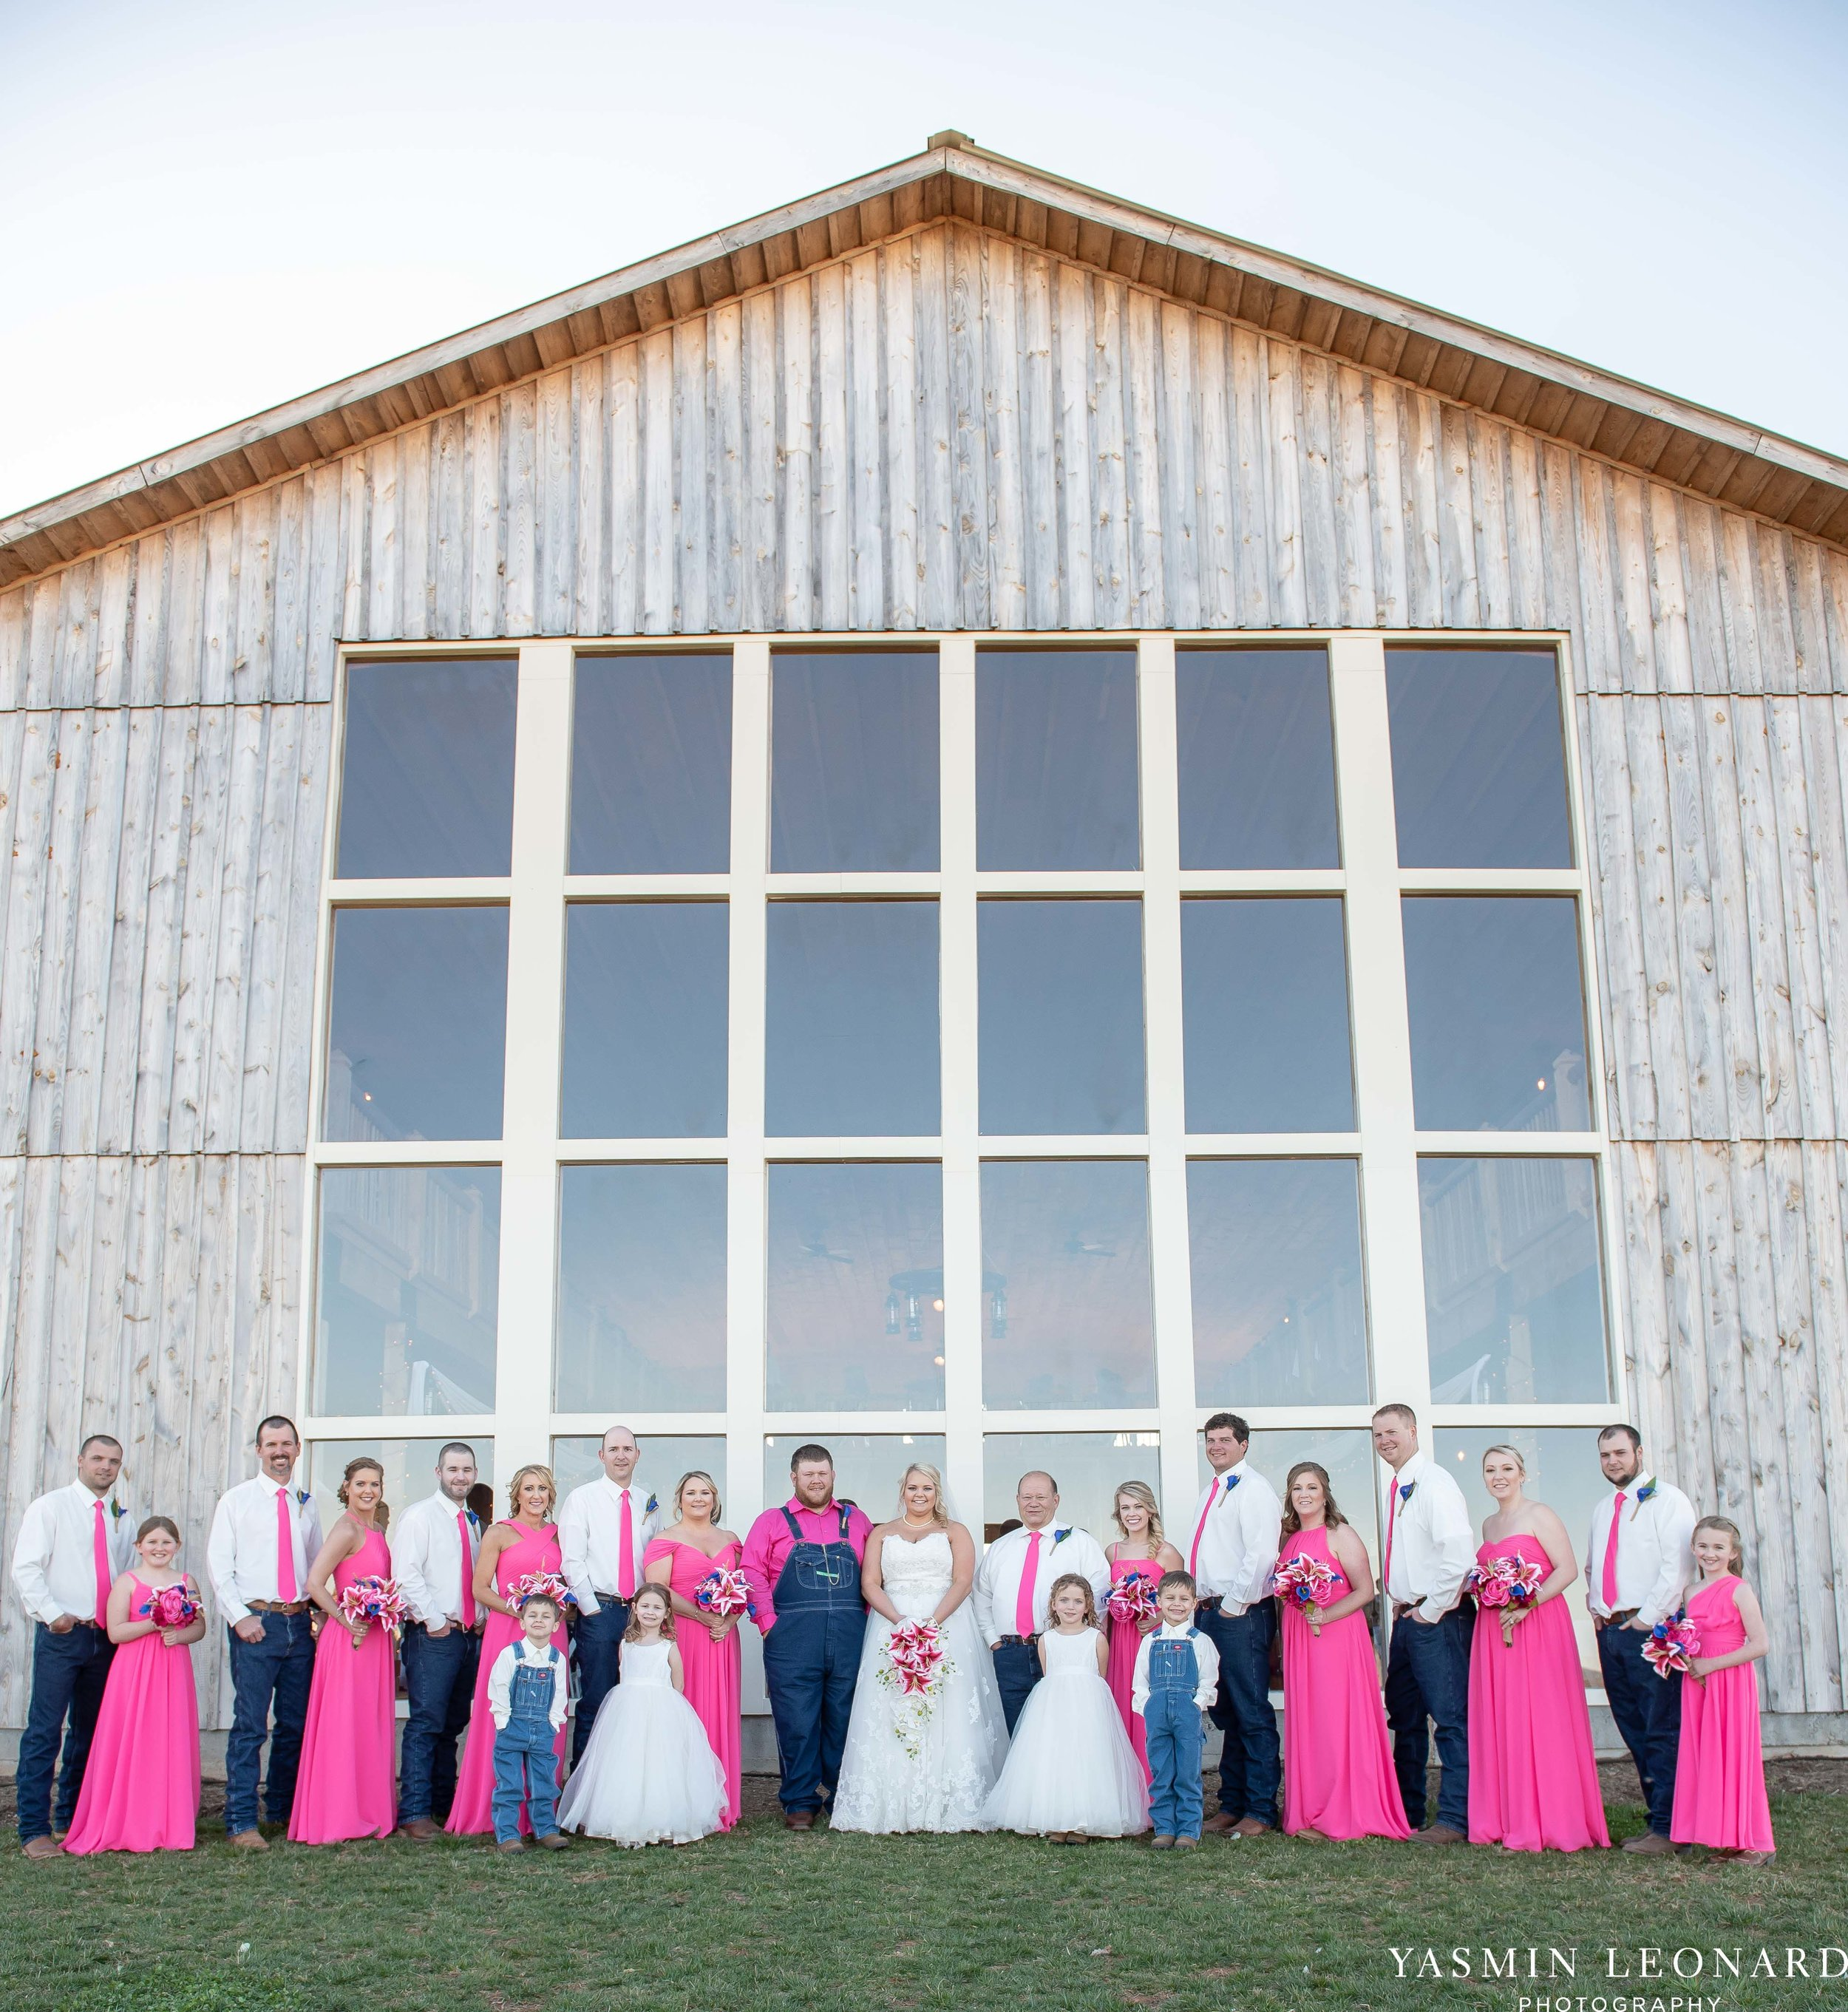 The Barn at Heritage Farm - Country Wedding - Pink and Blue Wedding - Barn Wedding - Outdoor Wedding - Cotton and Wheat Decor - Groom in Bibs - Pink Bridal Colors - Yasmin Leonard Photography-17.jpg